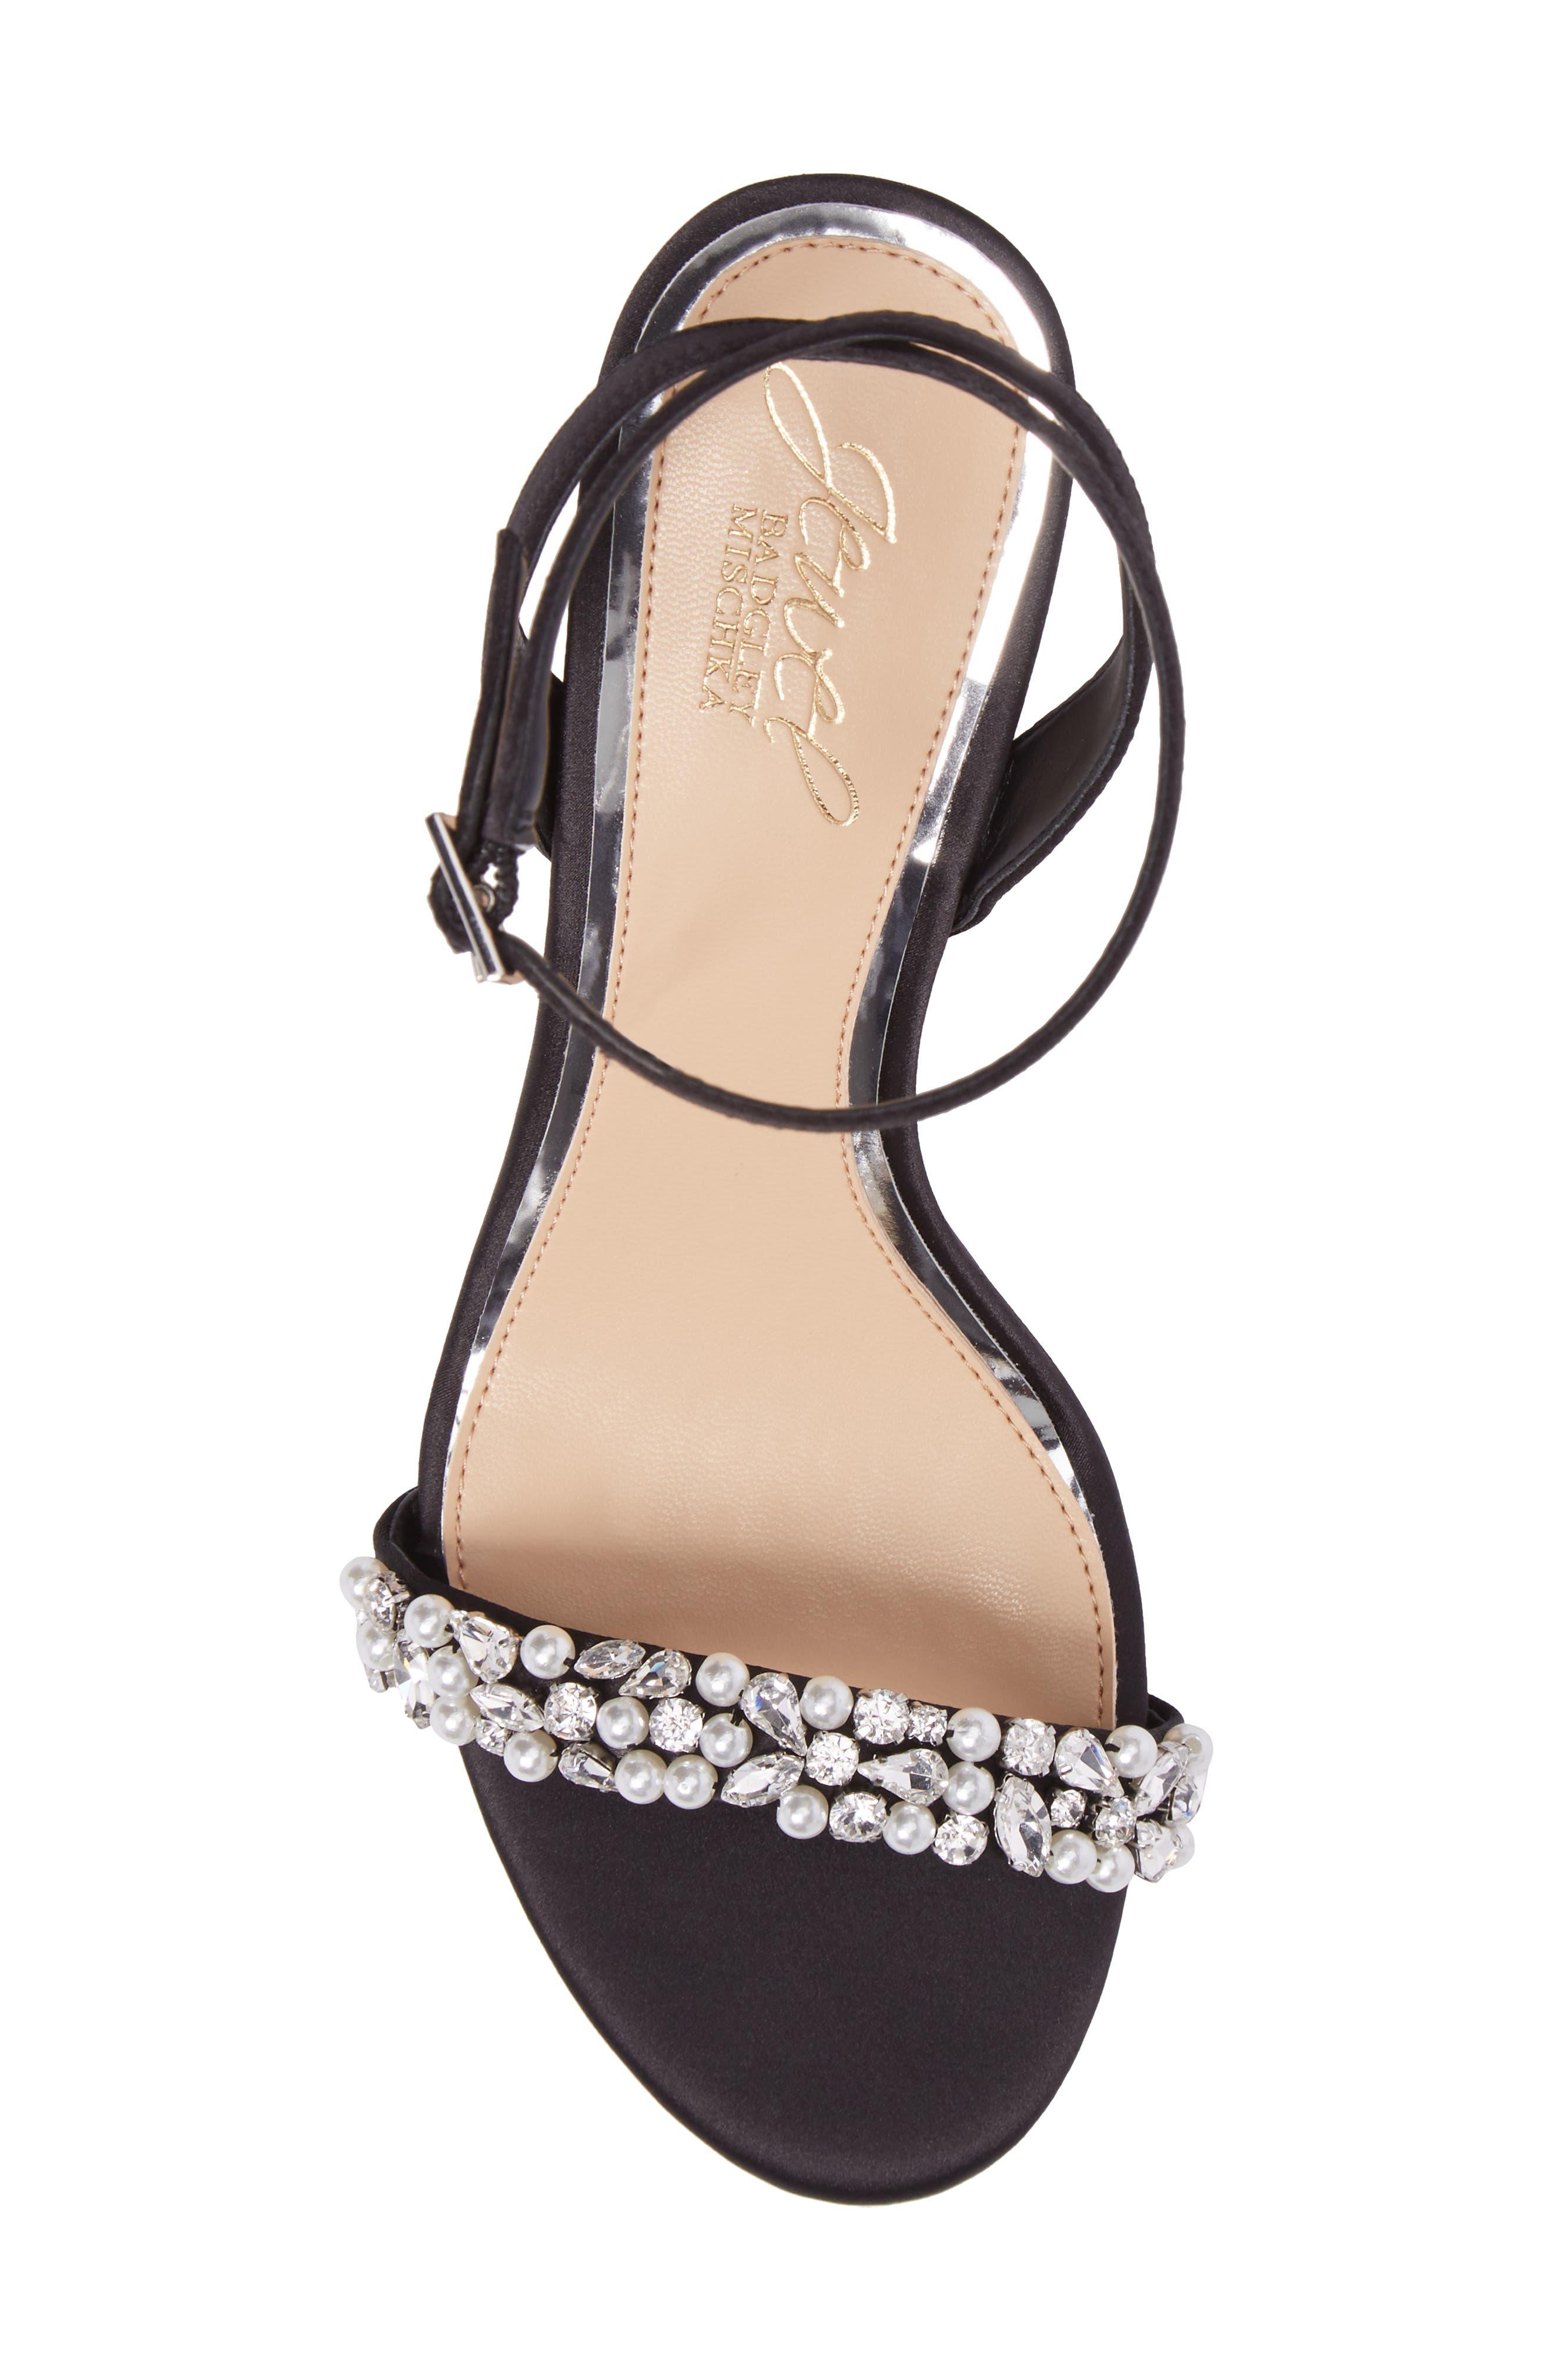 Jewel by Badgley Mischka Theodora Ankle Strap Sandal,                             Alternate thumbnail 5, color,                             Black Satin